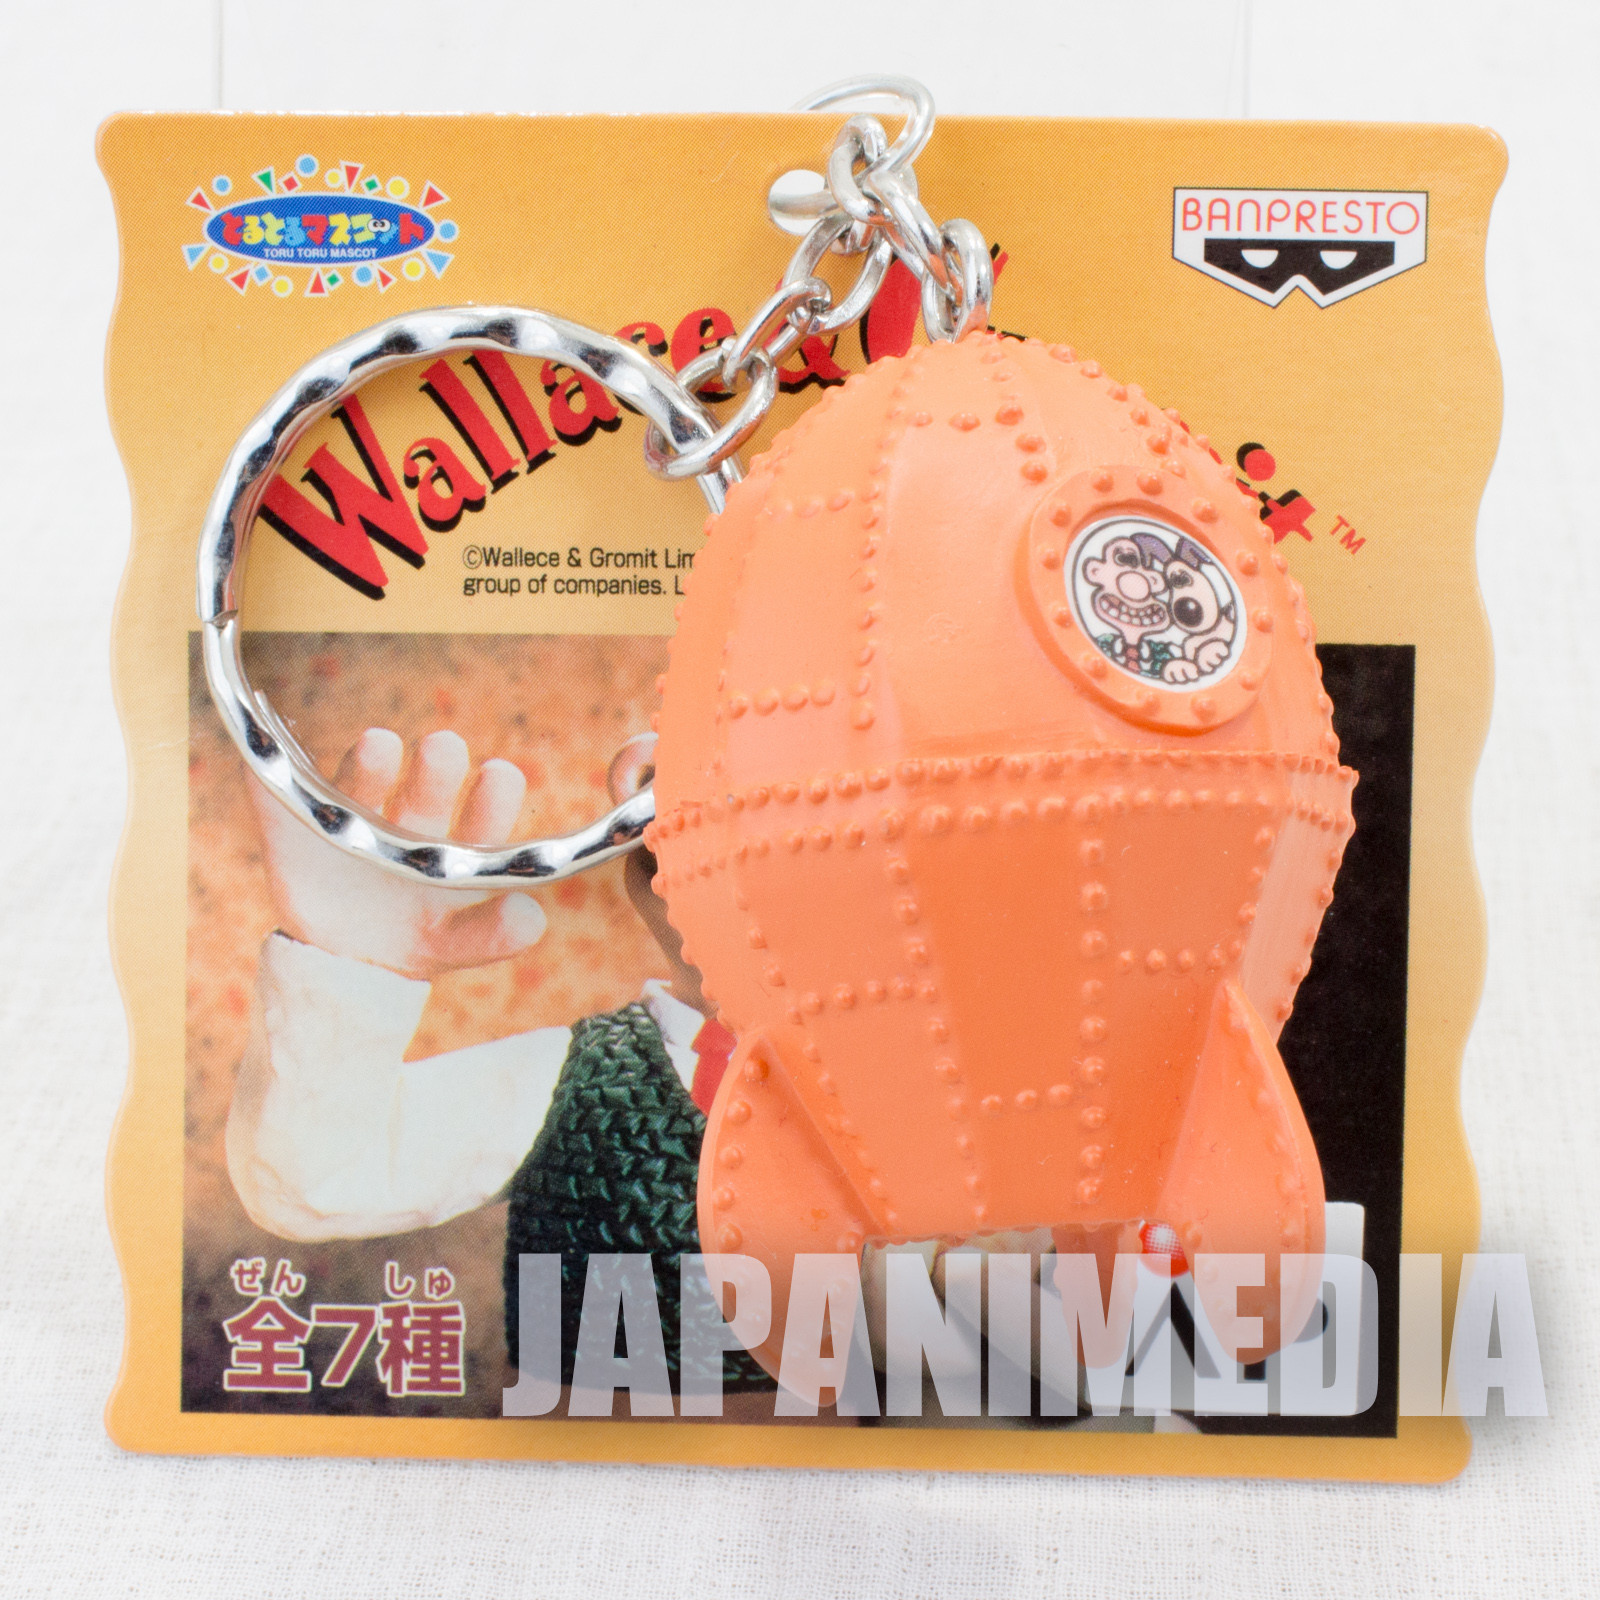 Wallace & Gromit Spaceship Figure Key Chain Banpresto JAPAN Ardman ANIME